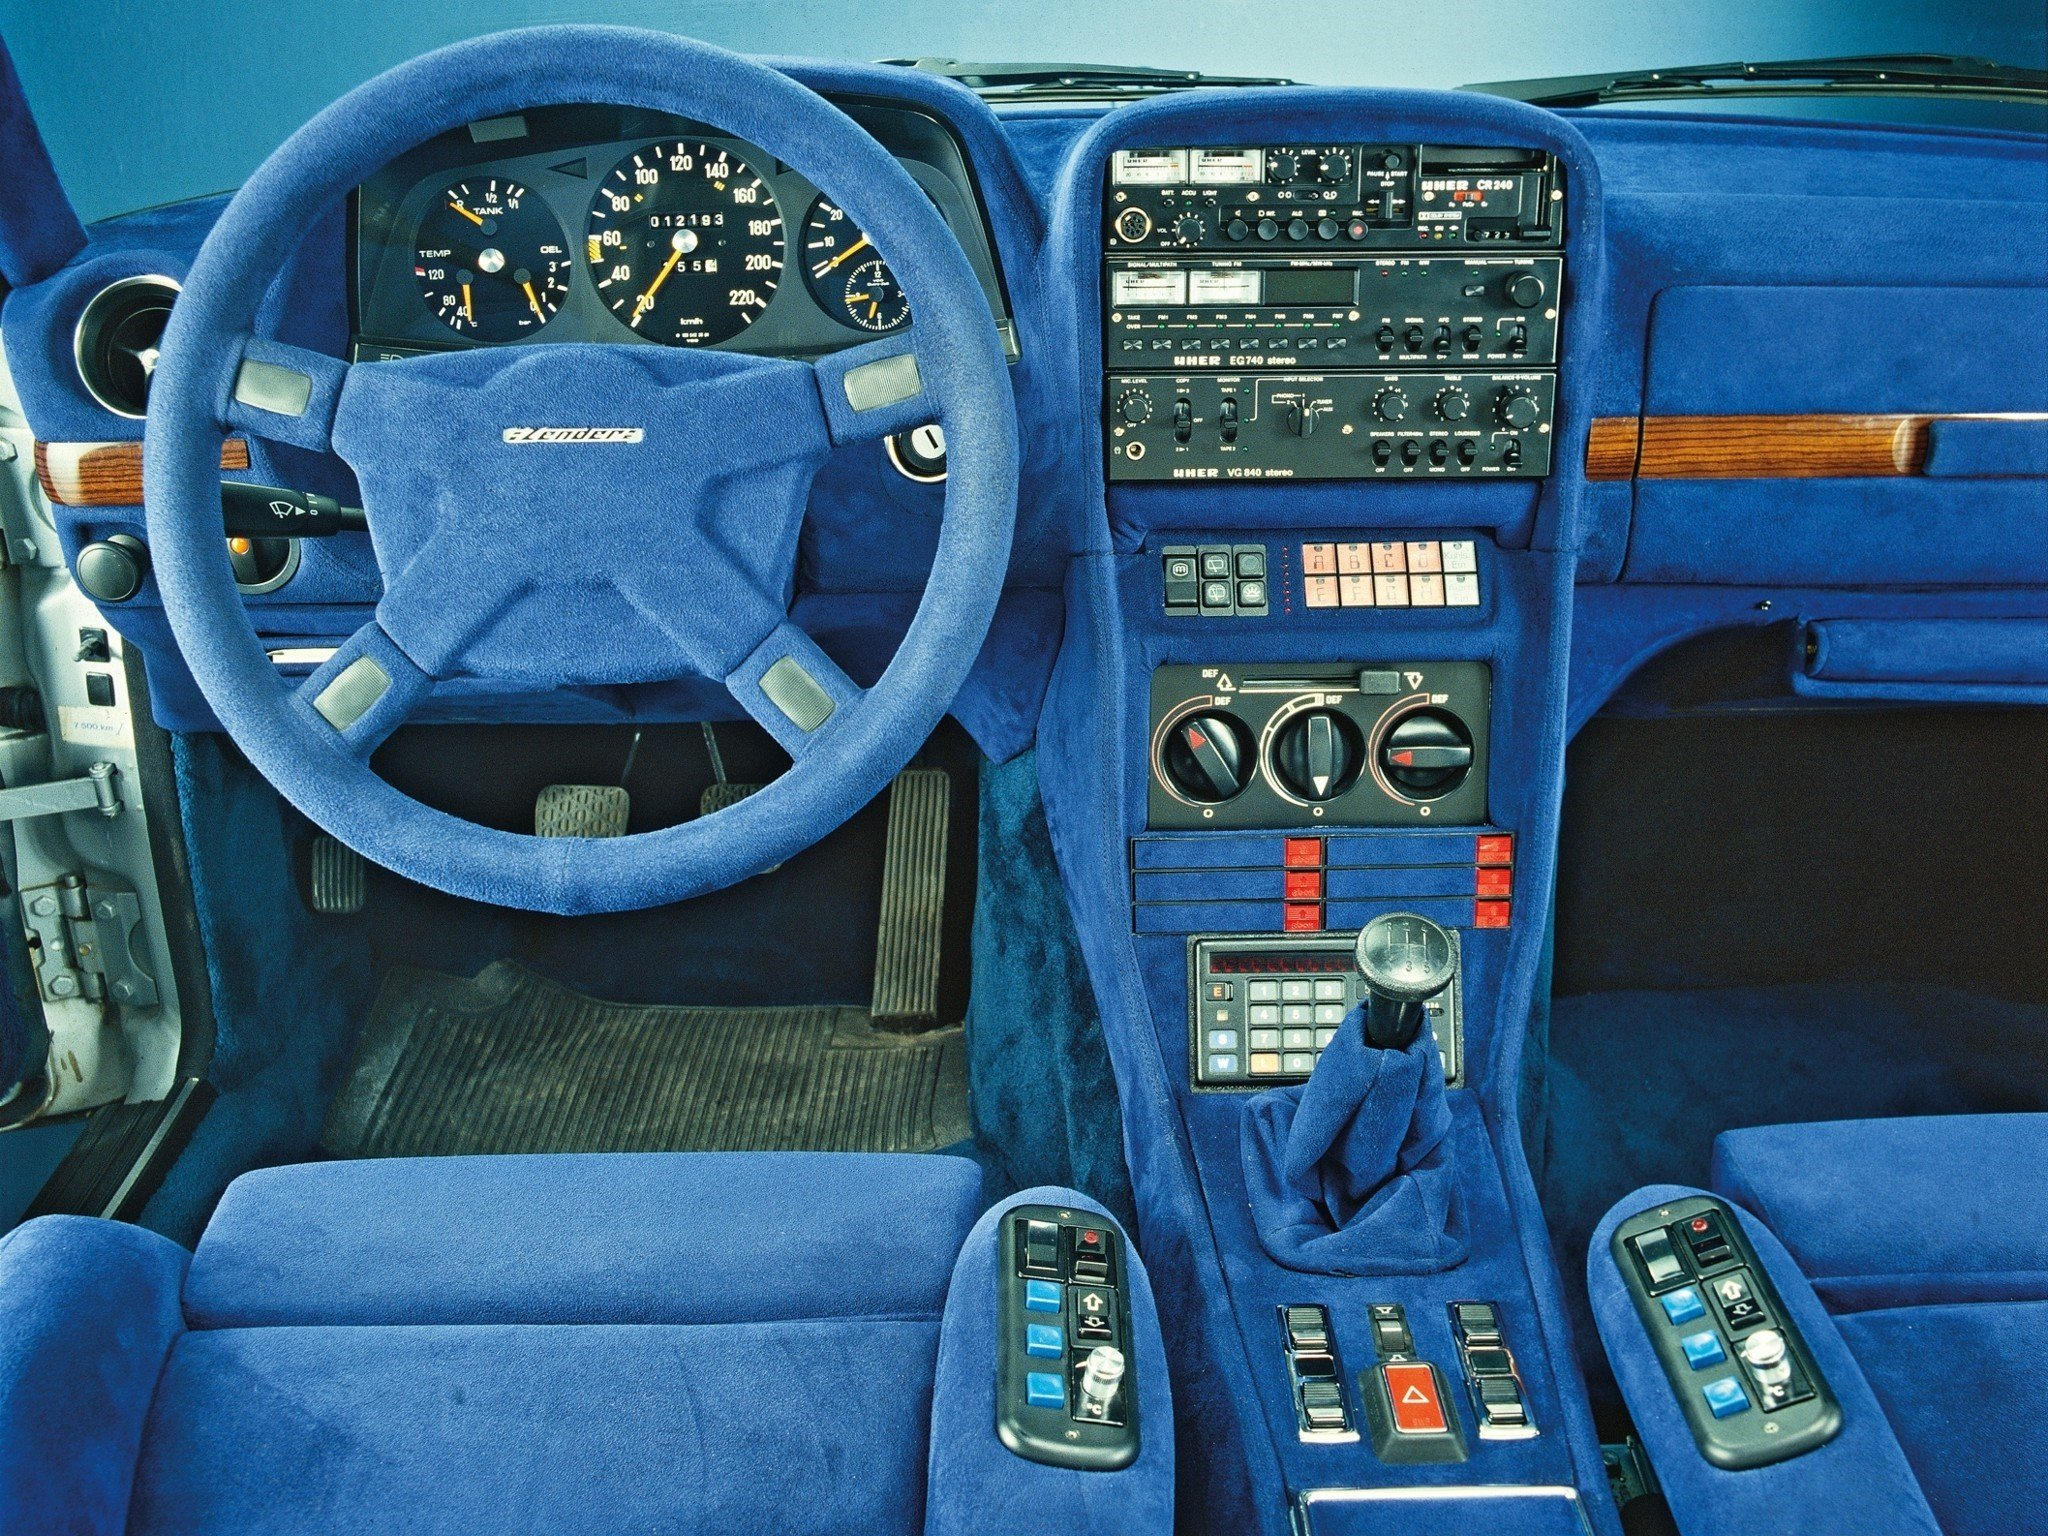 1980 Zender Mercedes-Benz 280 T-E (S123) stationwagon ...